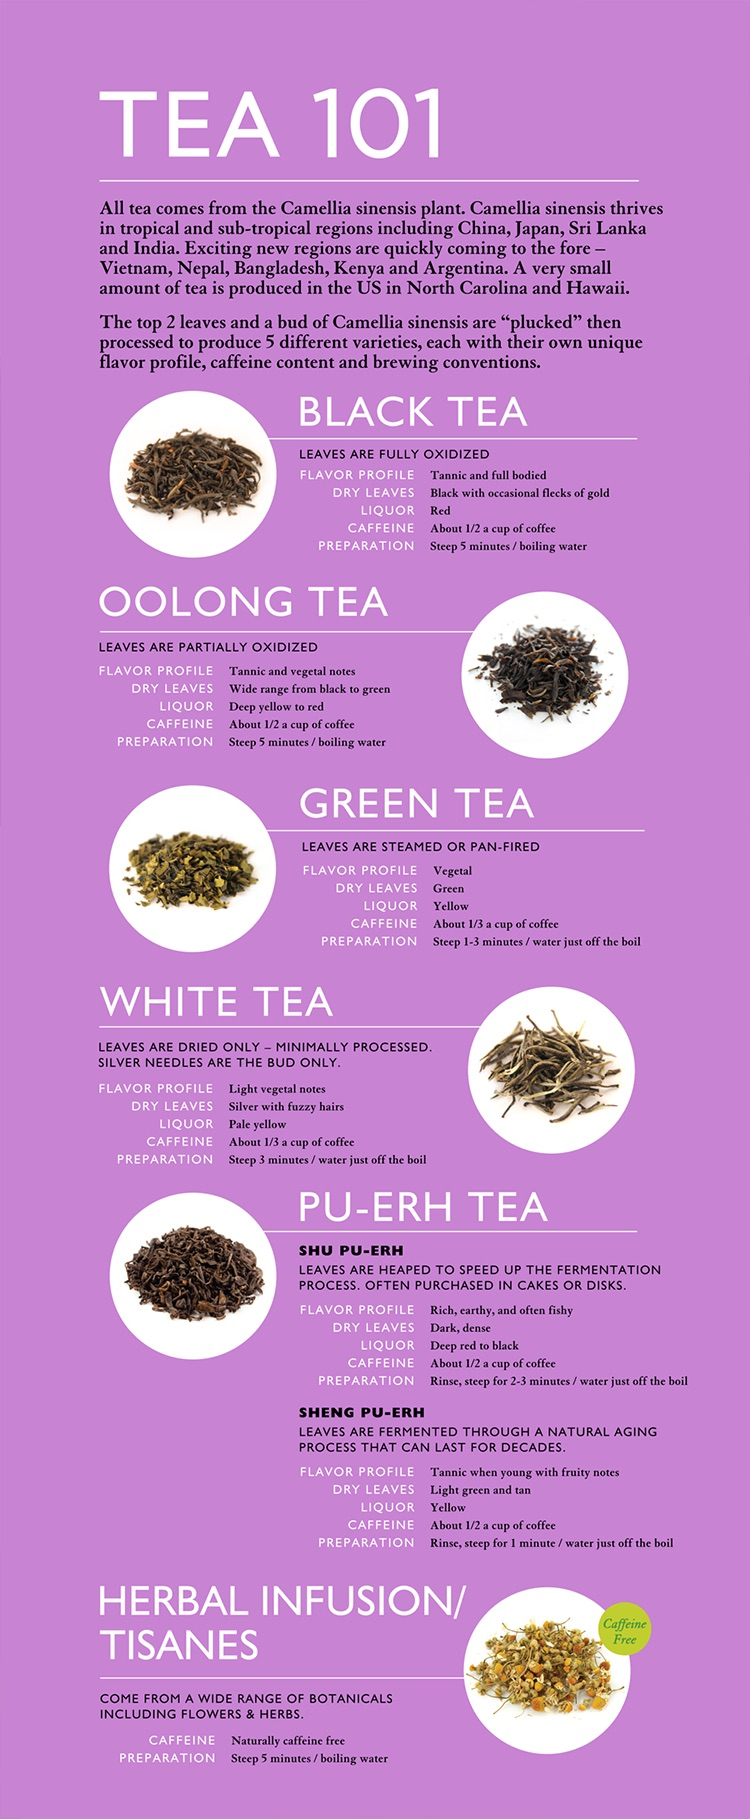 Teatulia Tea 101